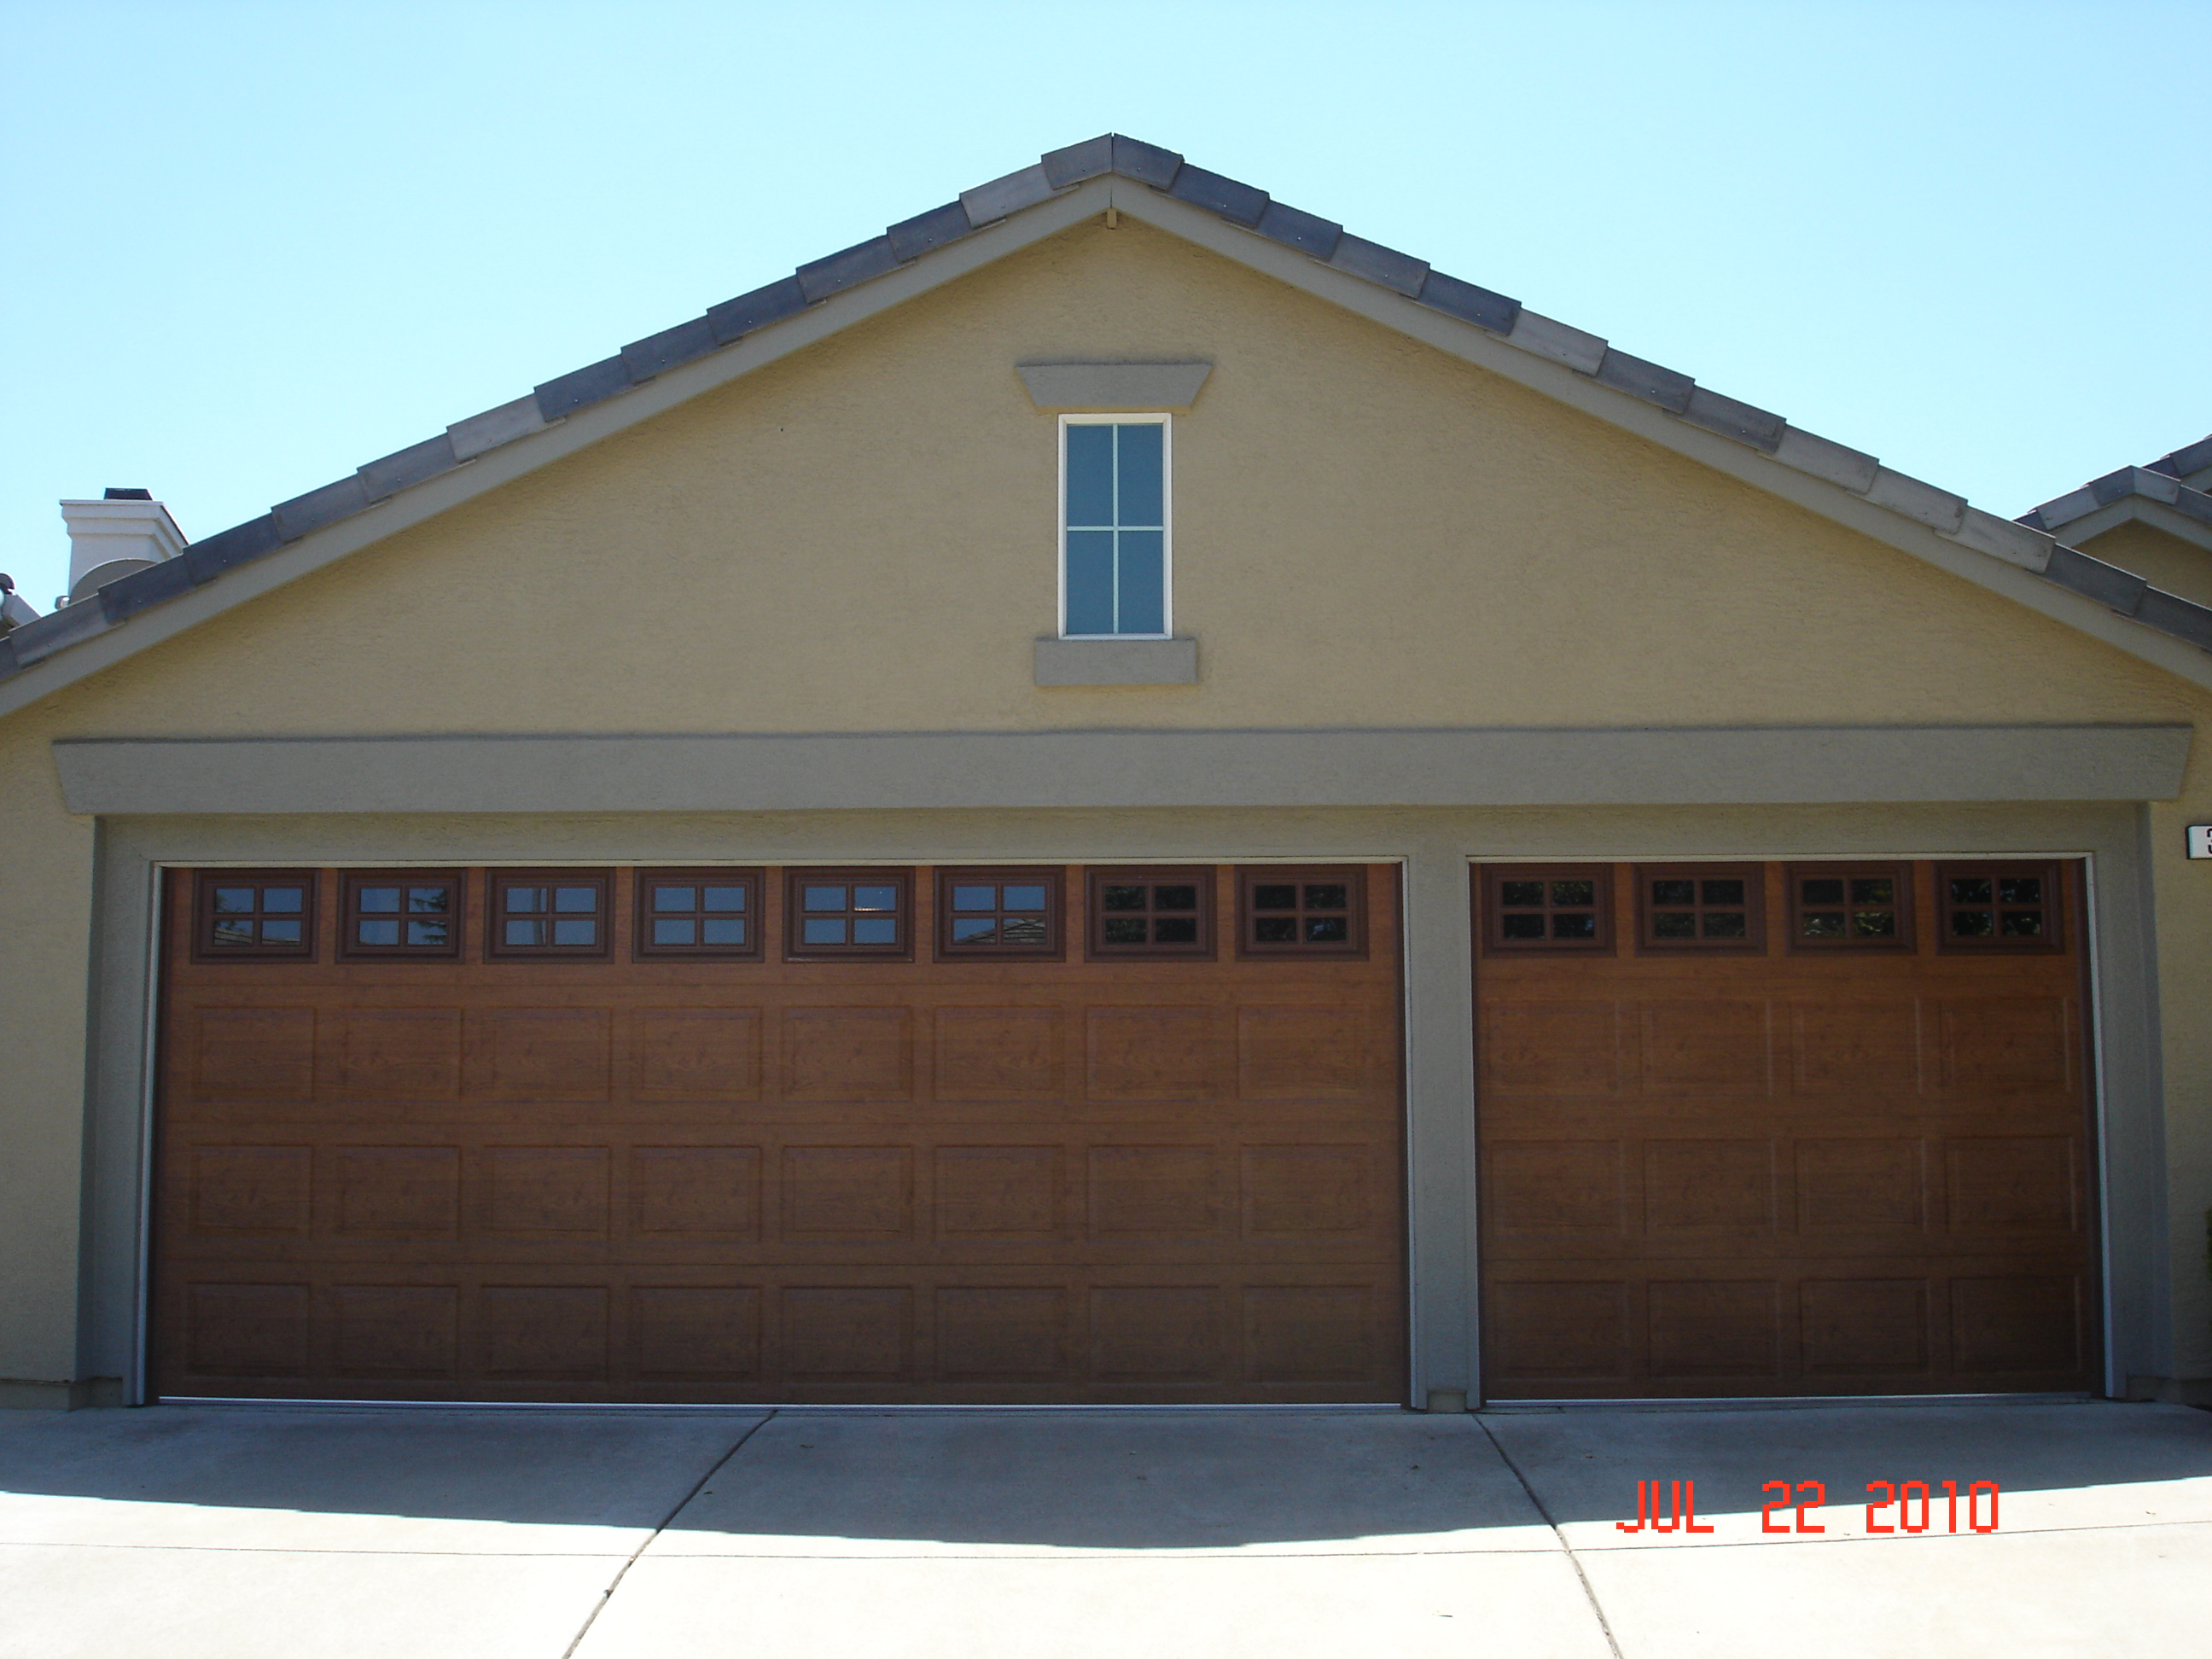 national garage door co rancho cordova ca 95742 ForNational Garage Door Rancho Cordova